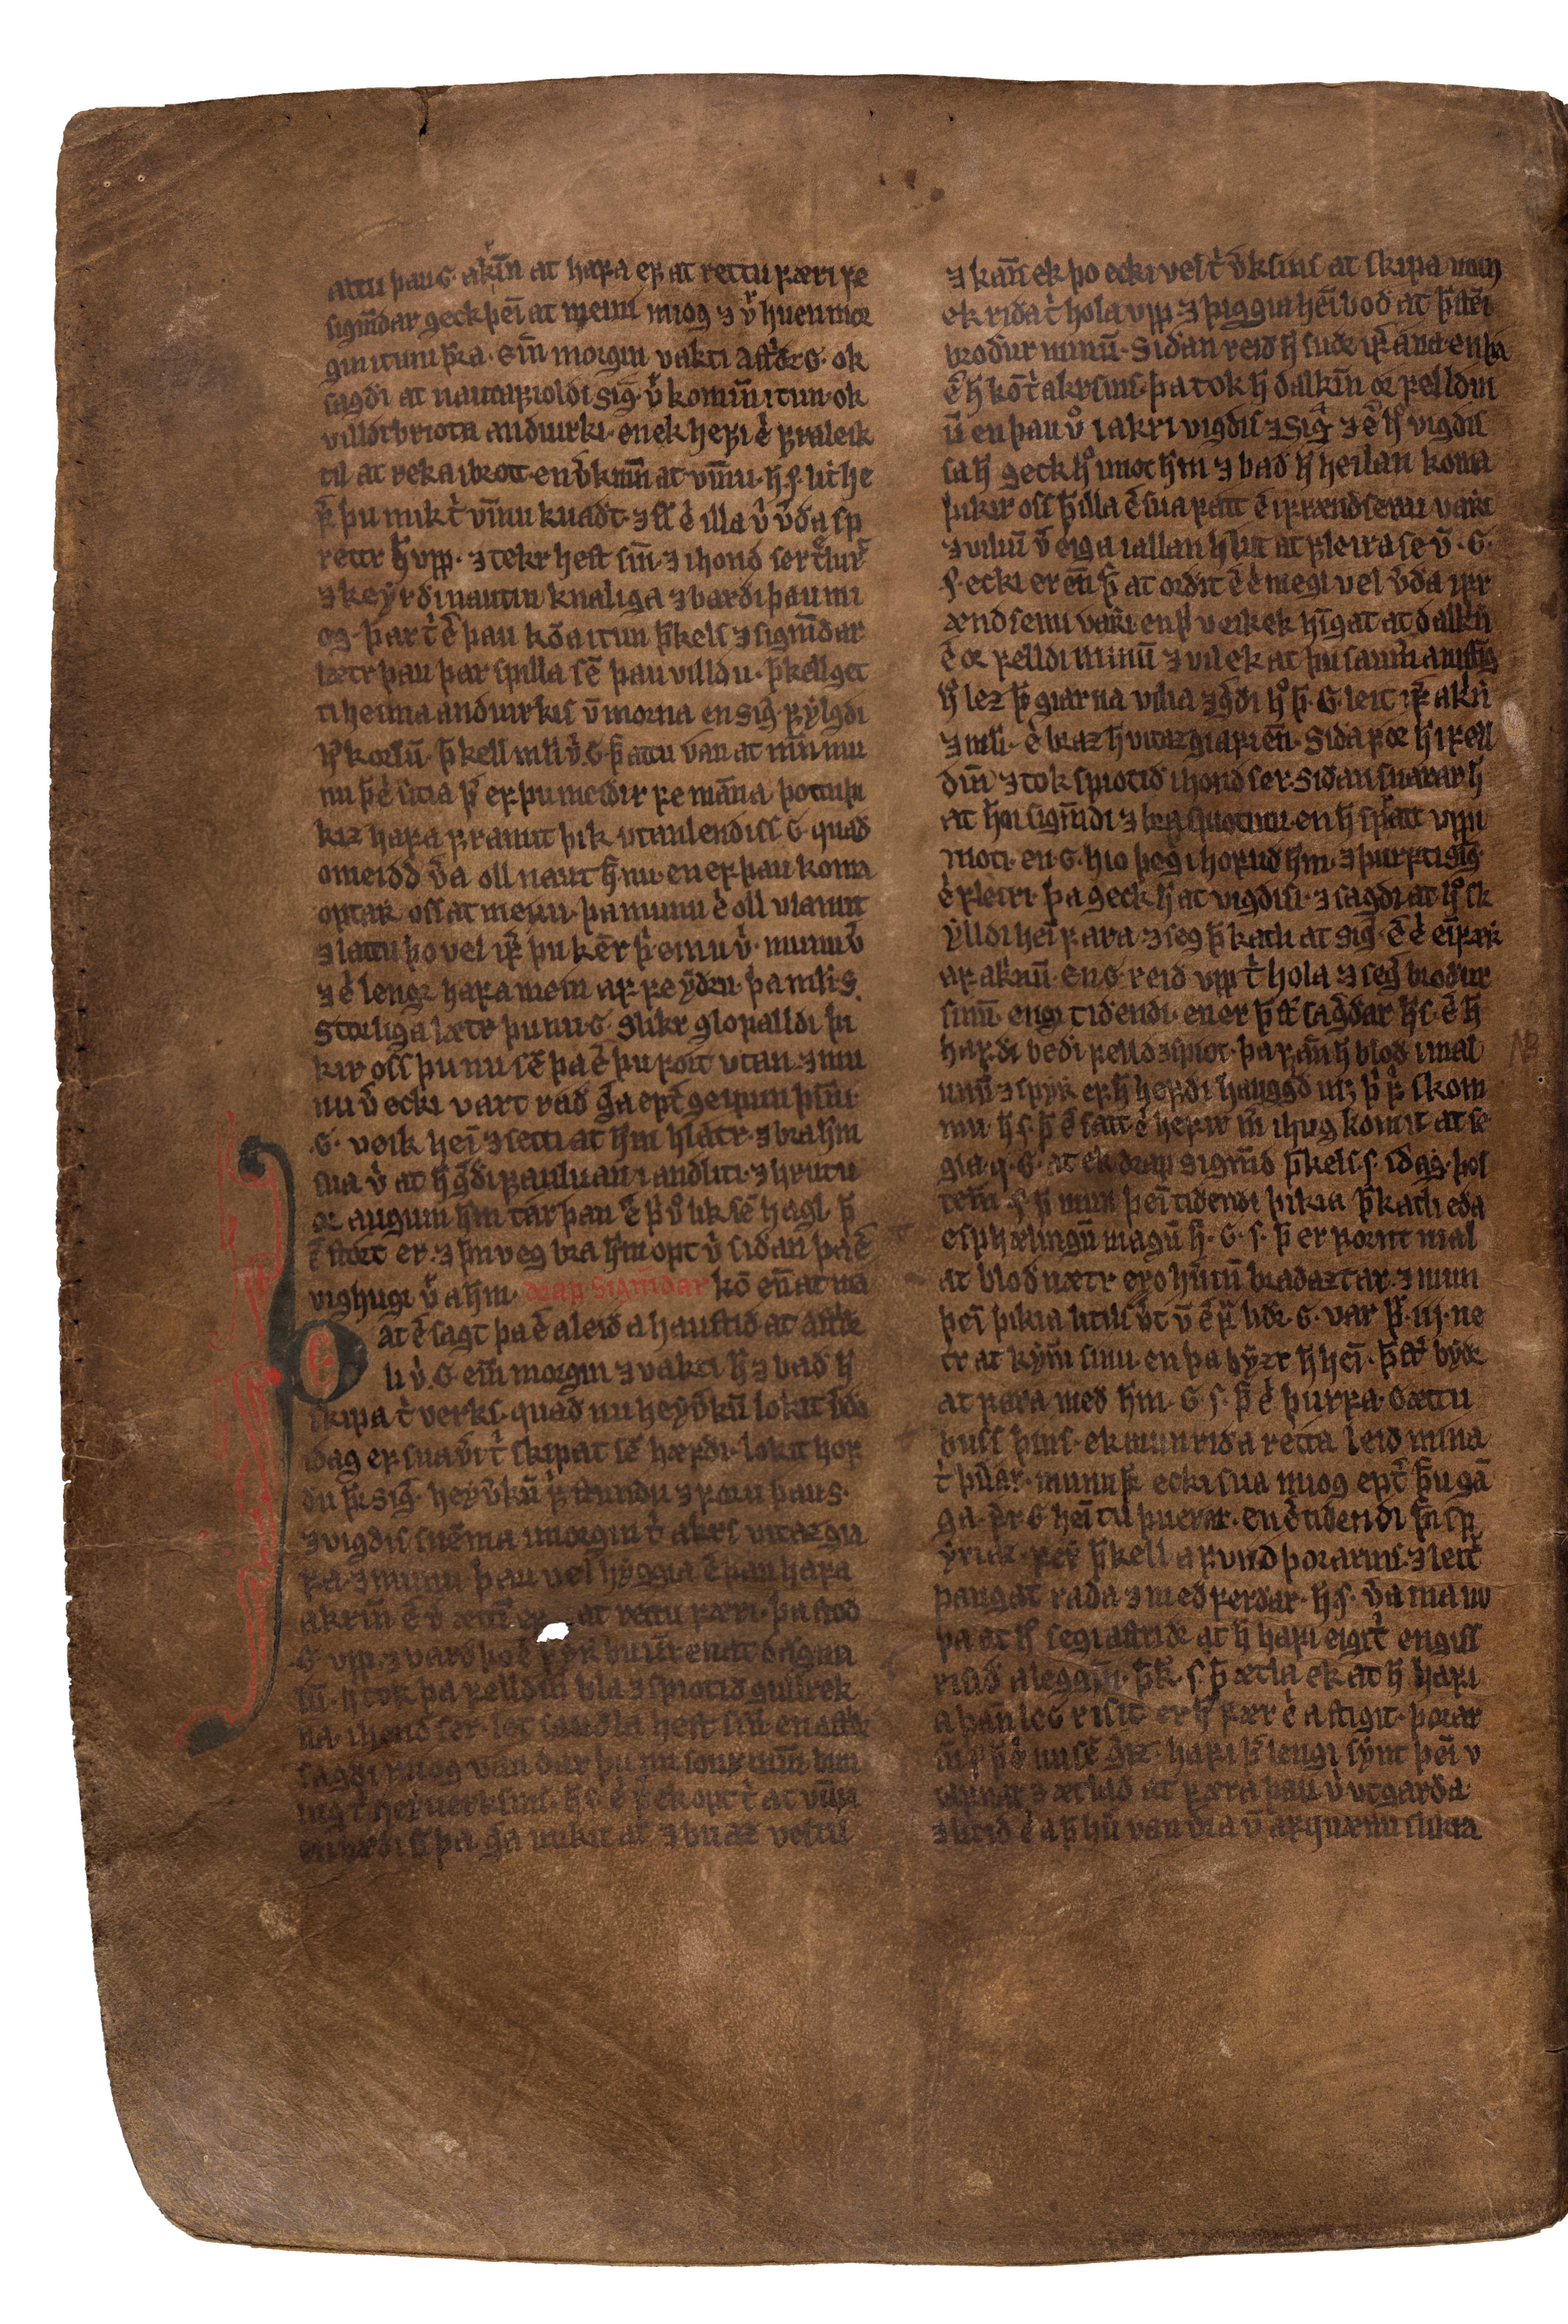 AM 132 fol - 132v